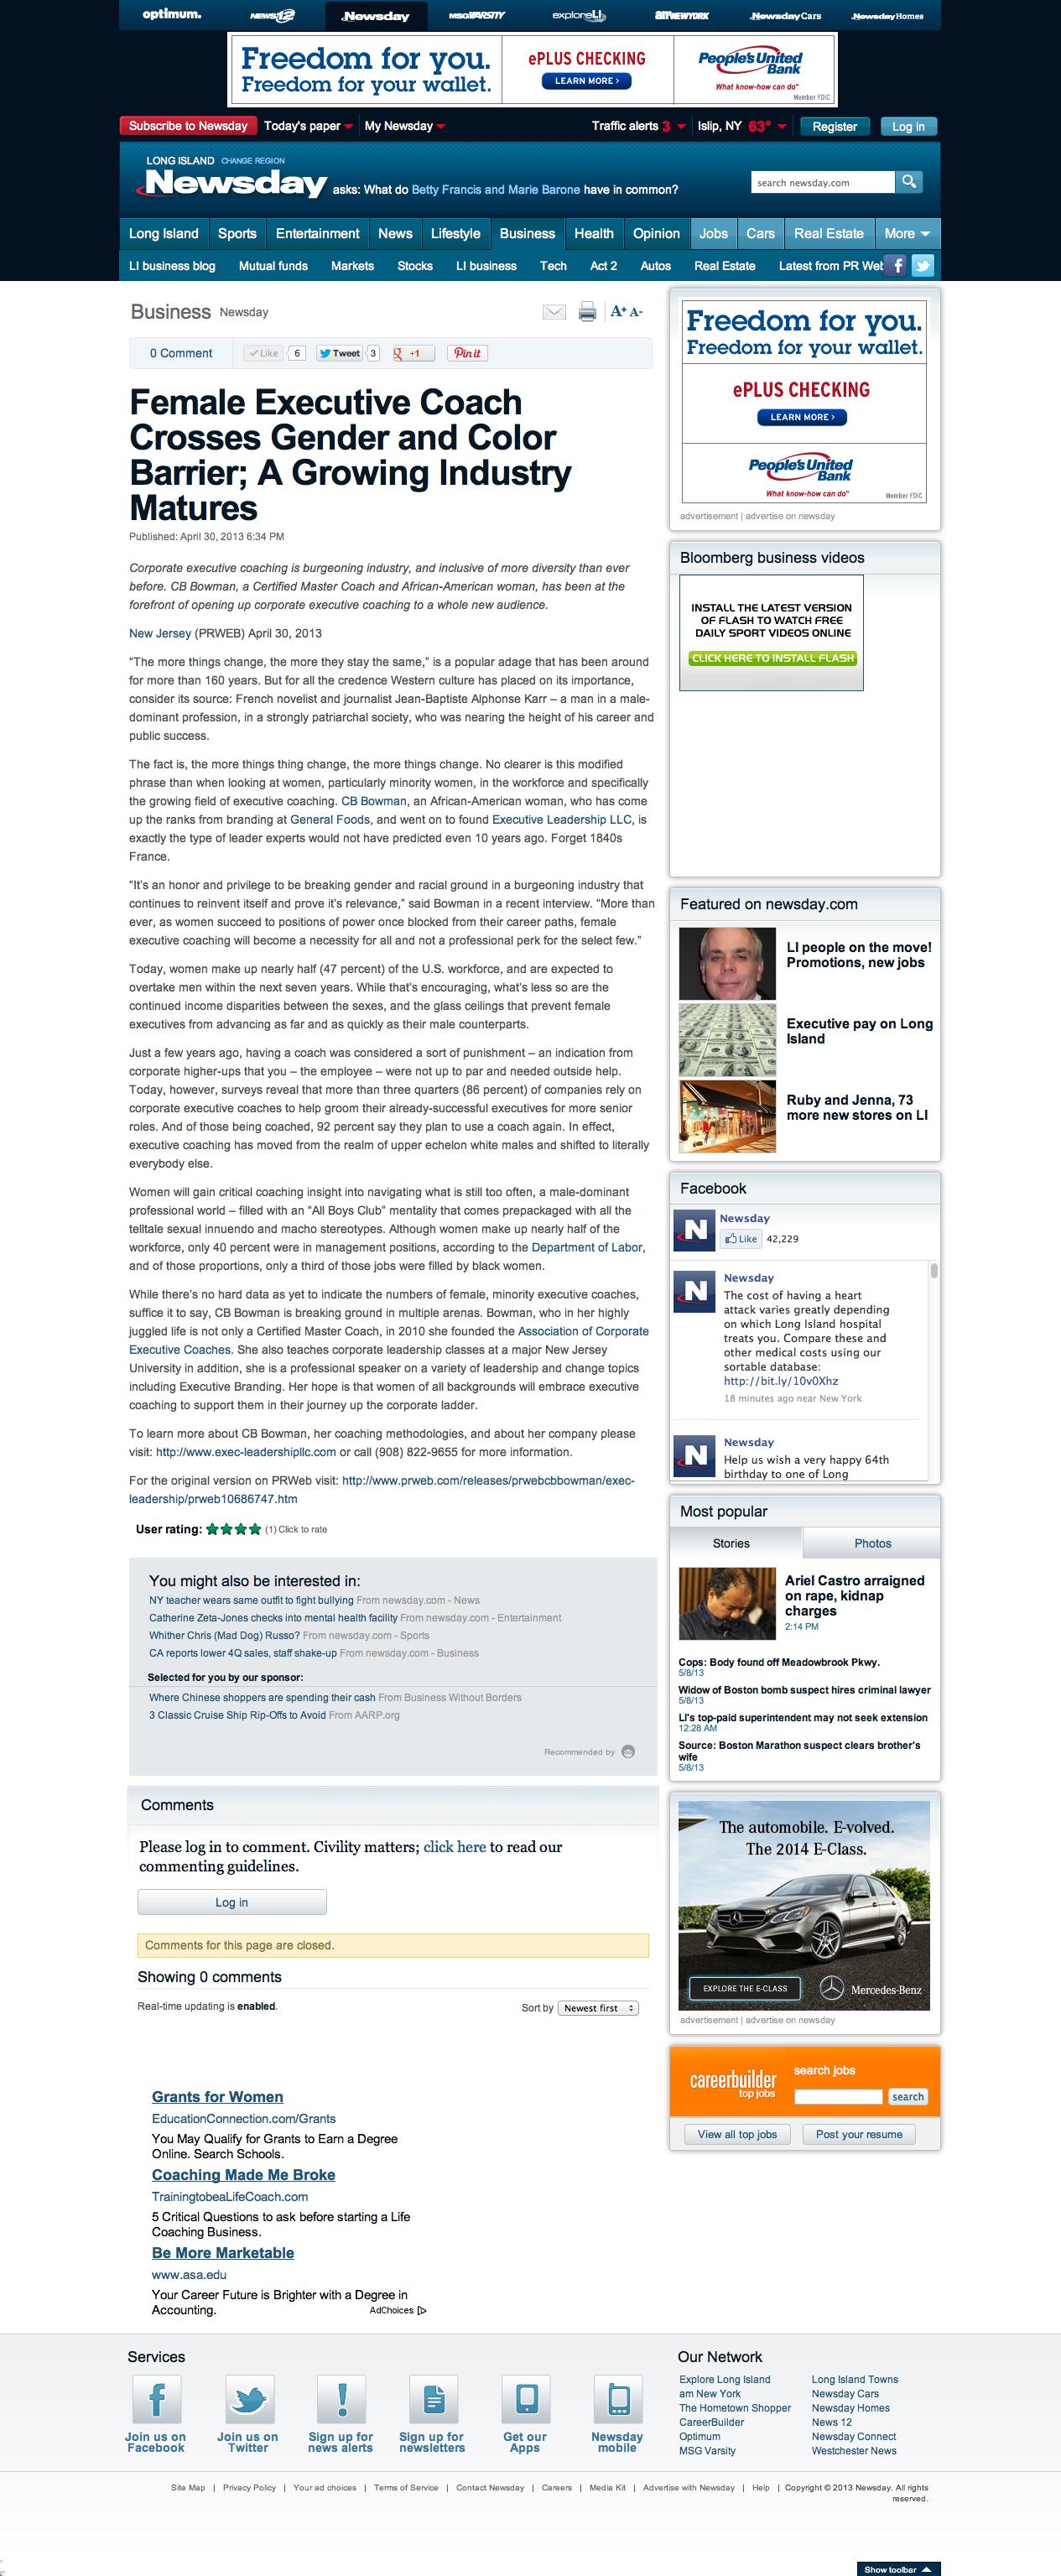 CB Press Release newsday2013